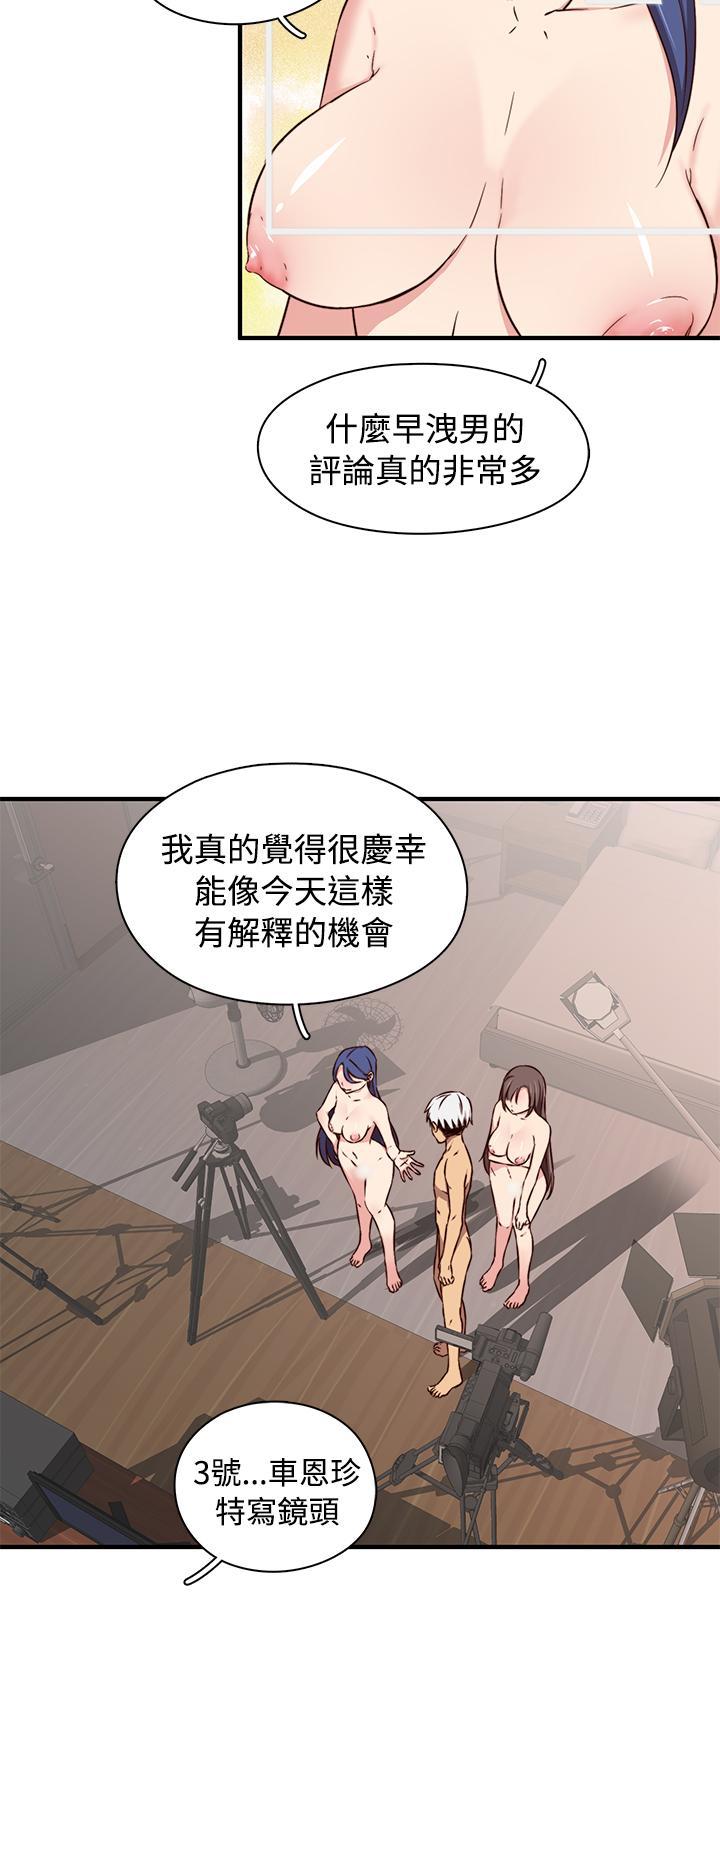 [Dasum & Puutaro] H-Campus H校园<第2季> ch.41-46 (chinese) 13